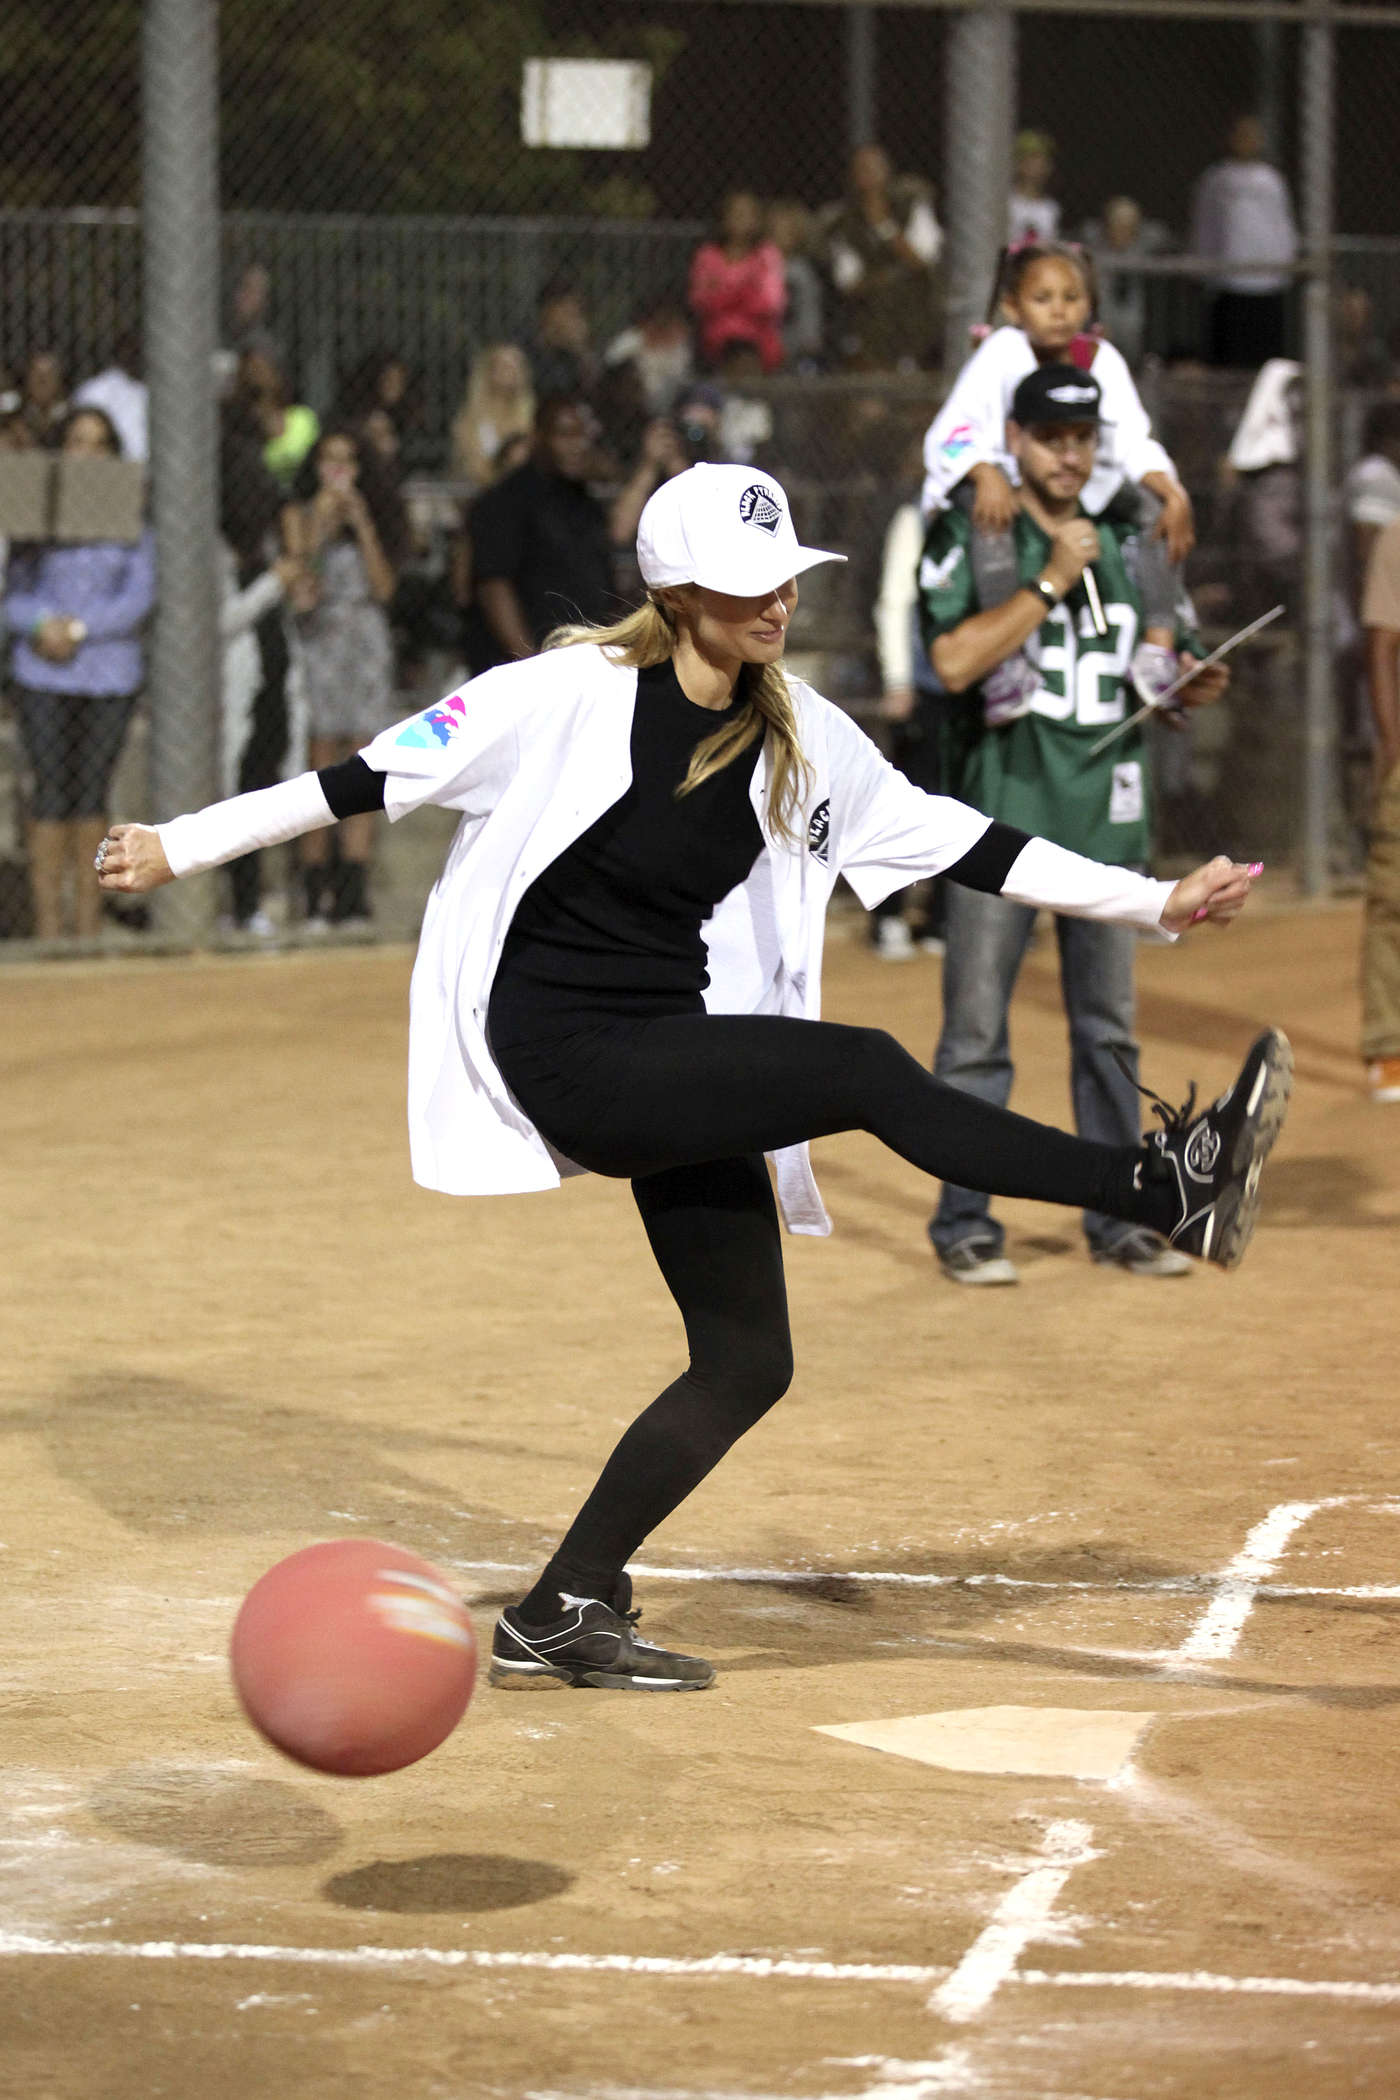 Paris Hilton - Kick'N It For Charity Celebrity Kick Ball Game in Glendale